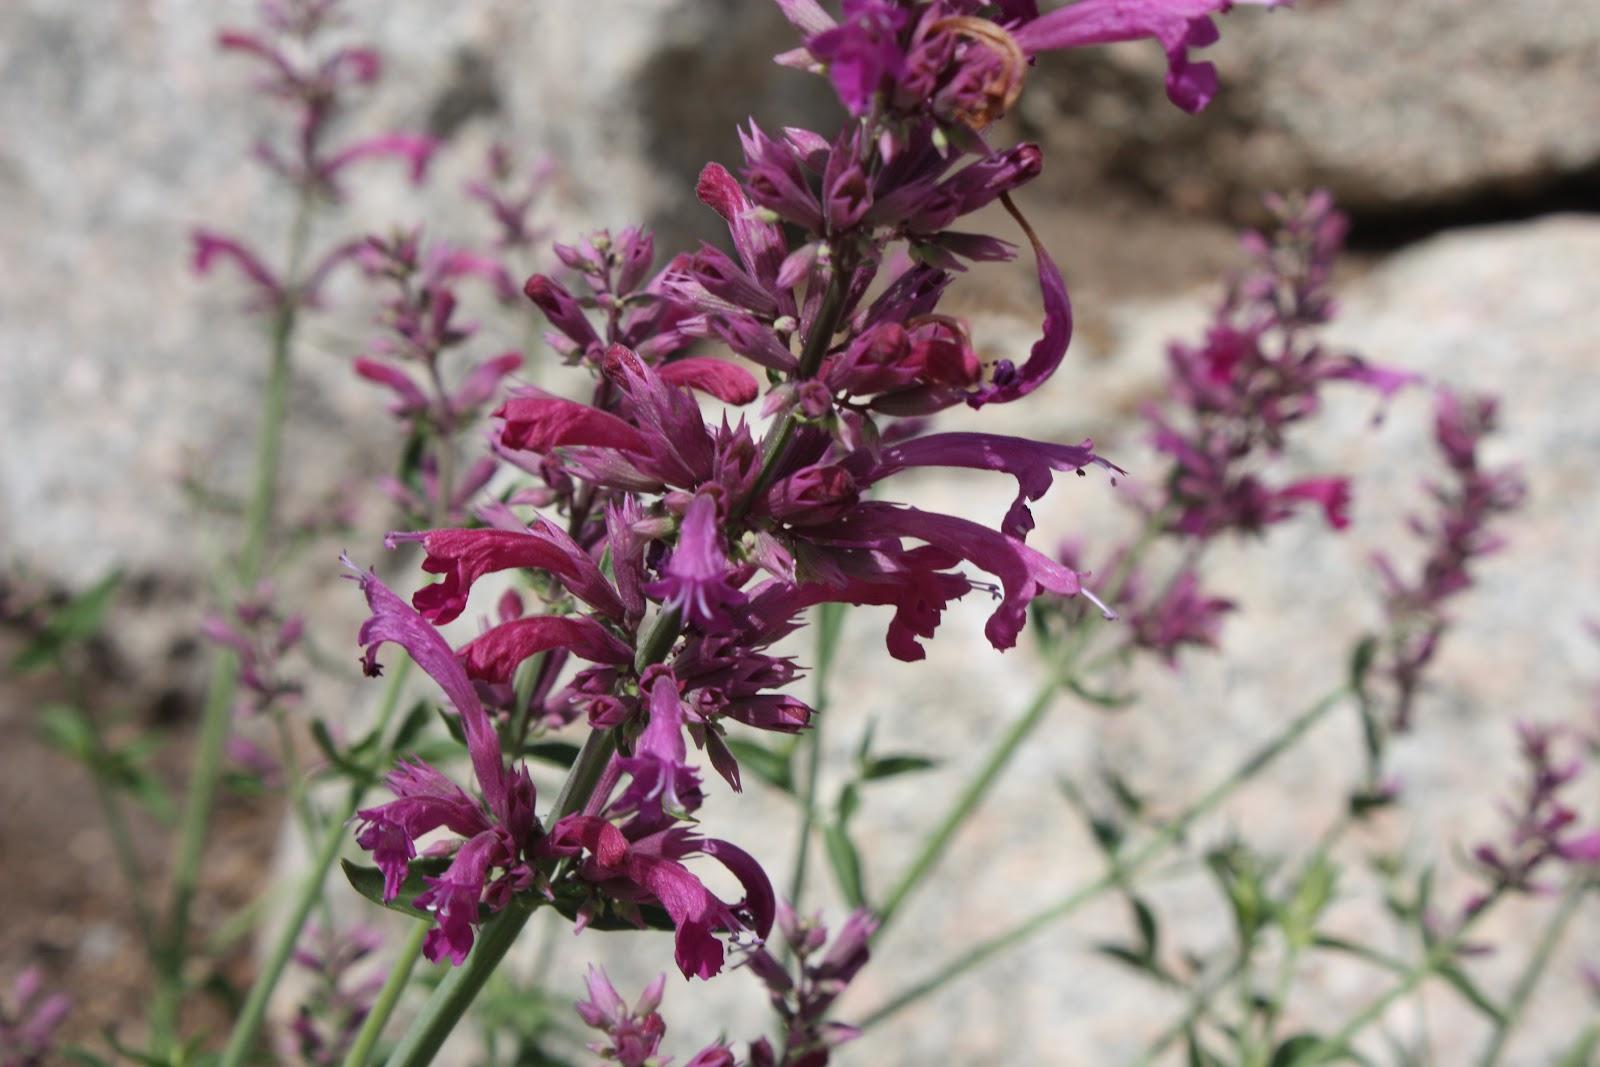 Texas hummingbird mint (Agastache cana)